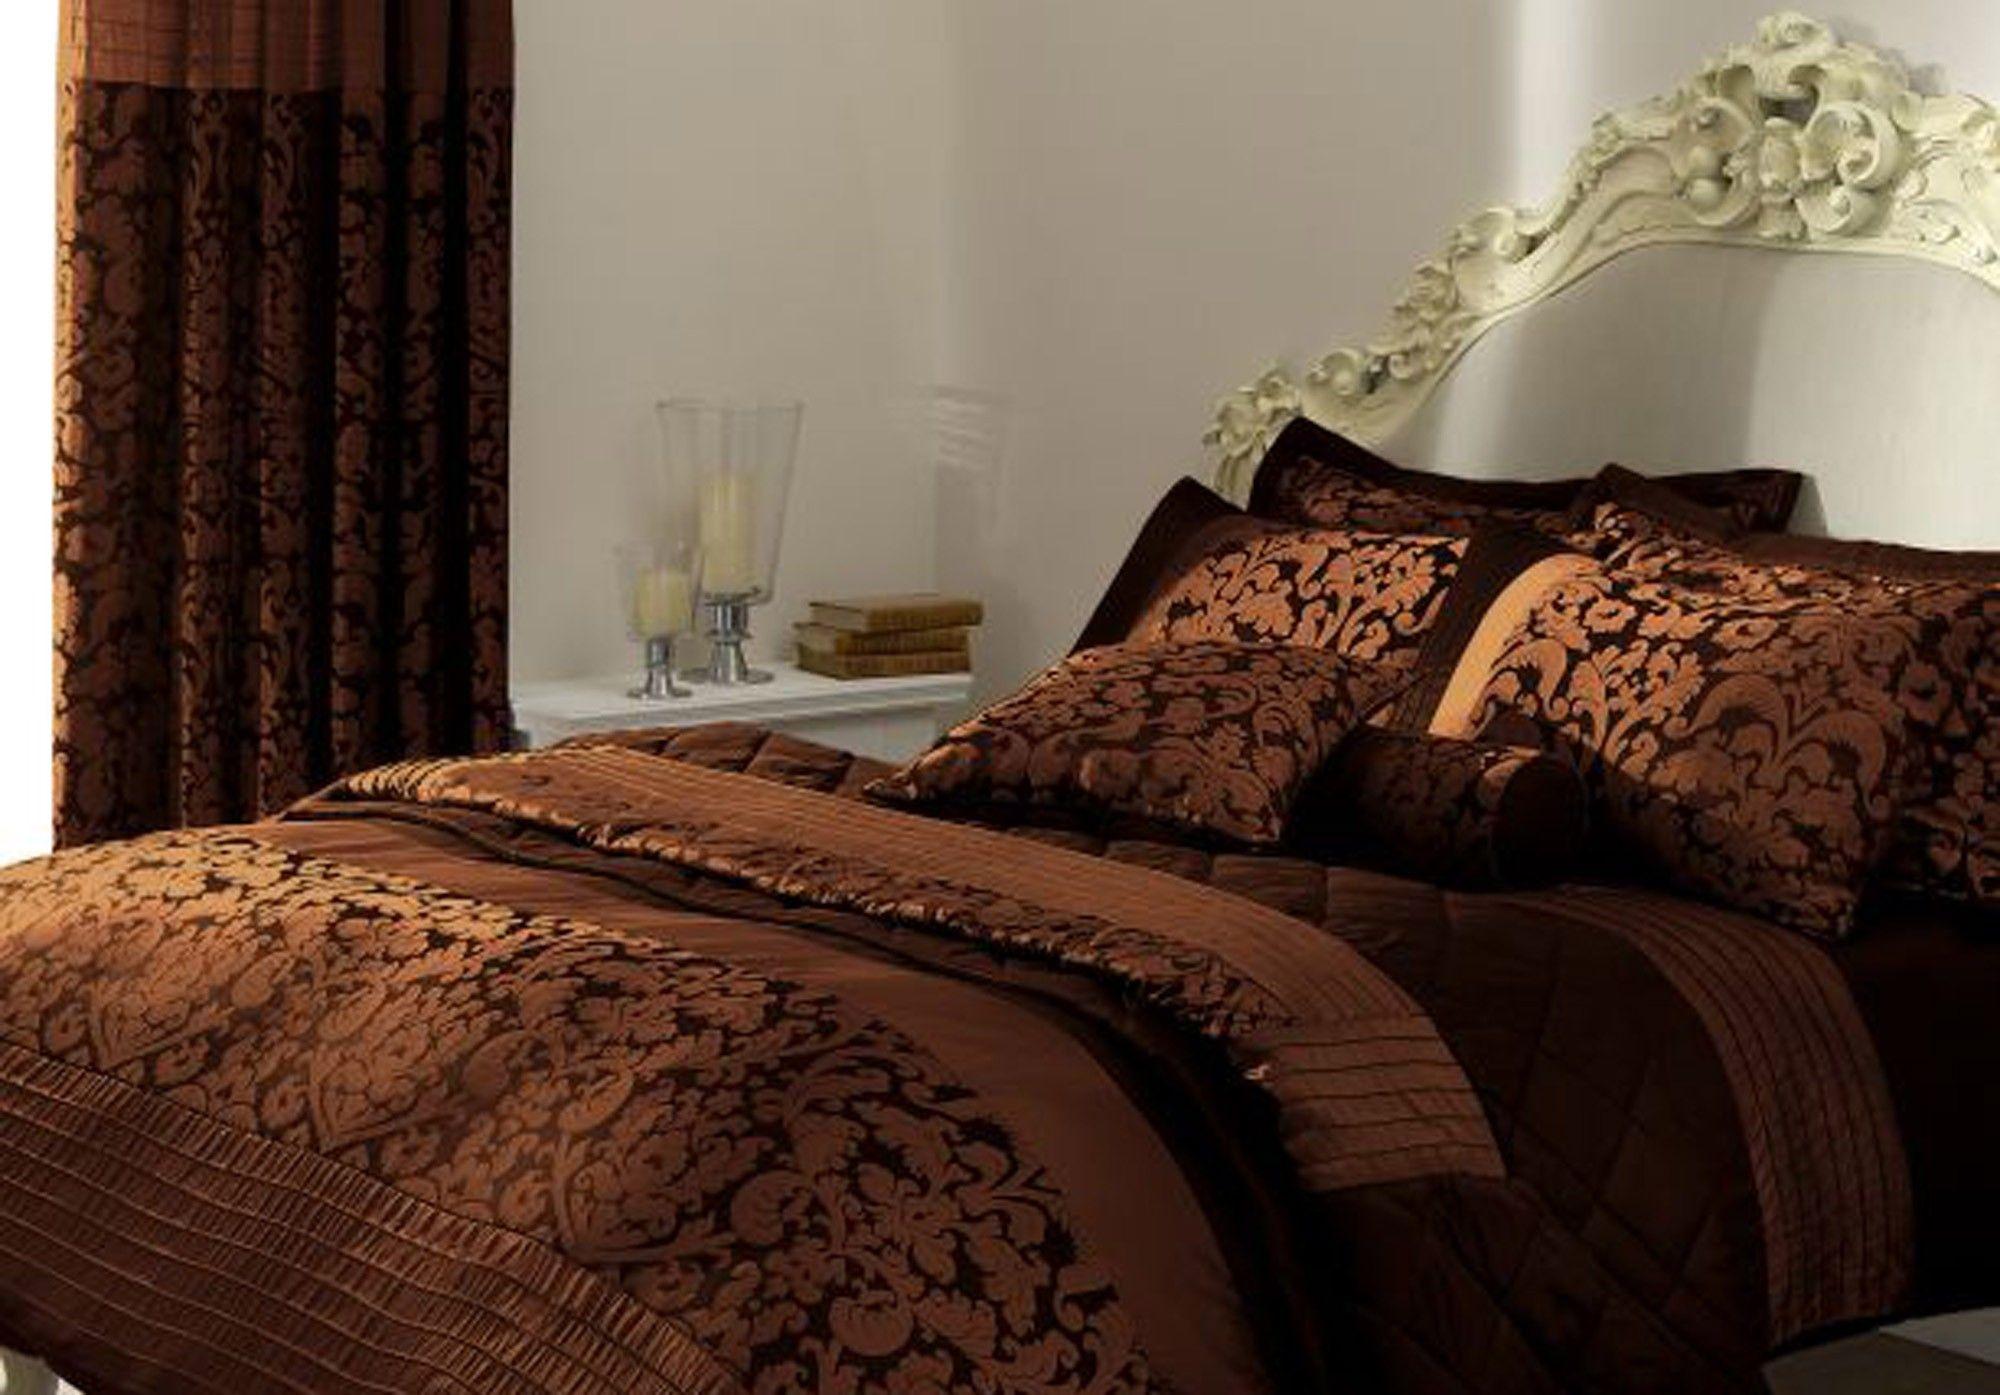 10 Beautiful Damask Patterned Bed Sets   Patterned bedding sets, Bedding  sets, Bed